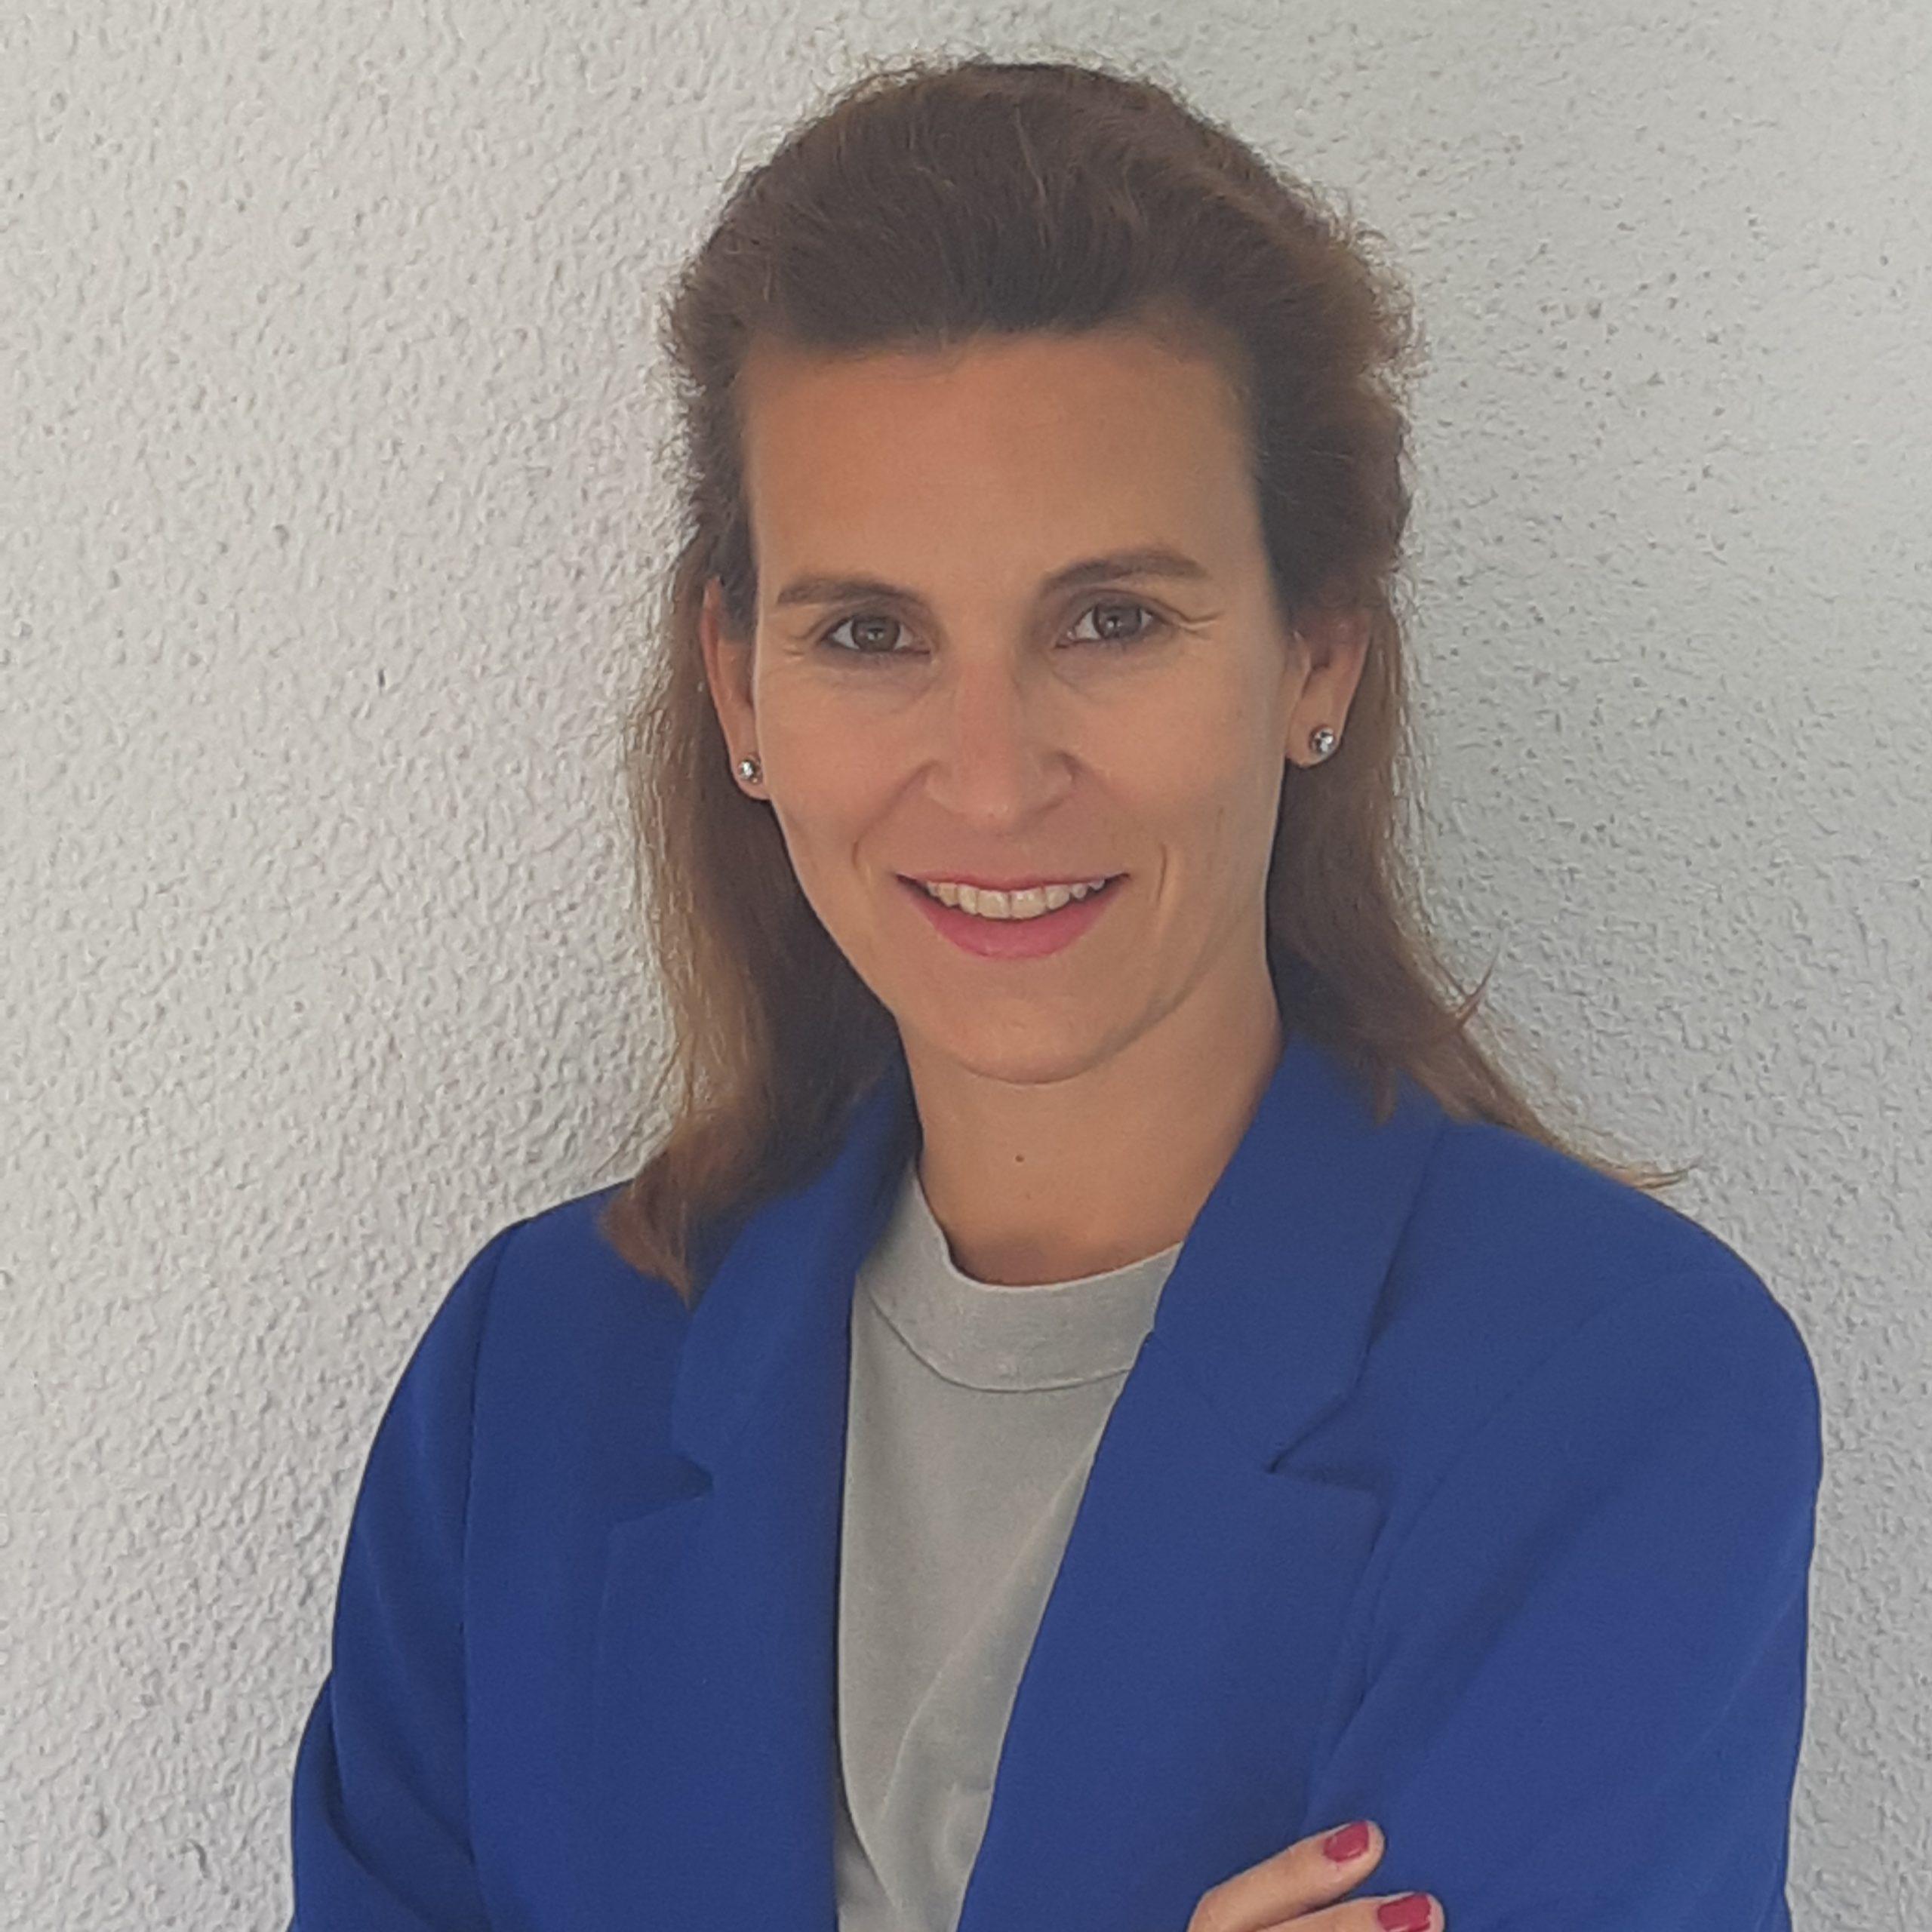 https://tundraadvisory.com/wp-content/uploads/2020/06/Pilar_SERSA-scaled.jpg